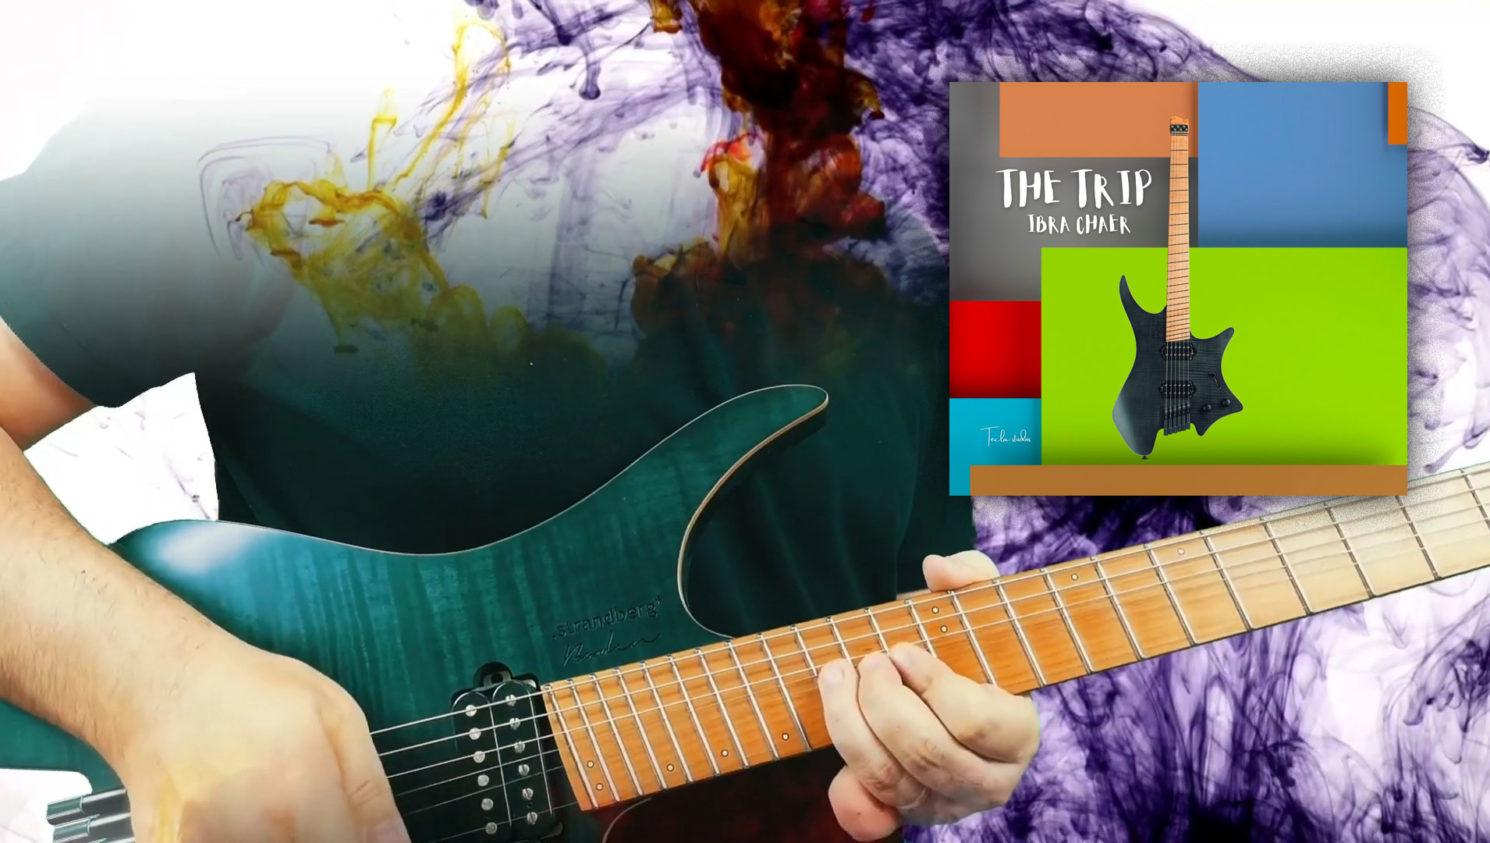 """The Trip"", primer álbum instrumental de Ibra Chaer"